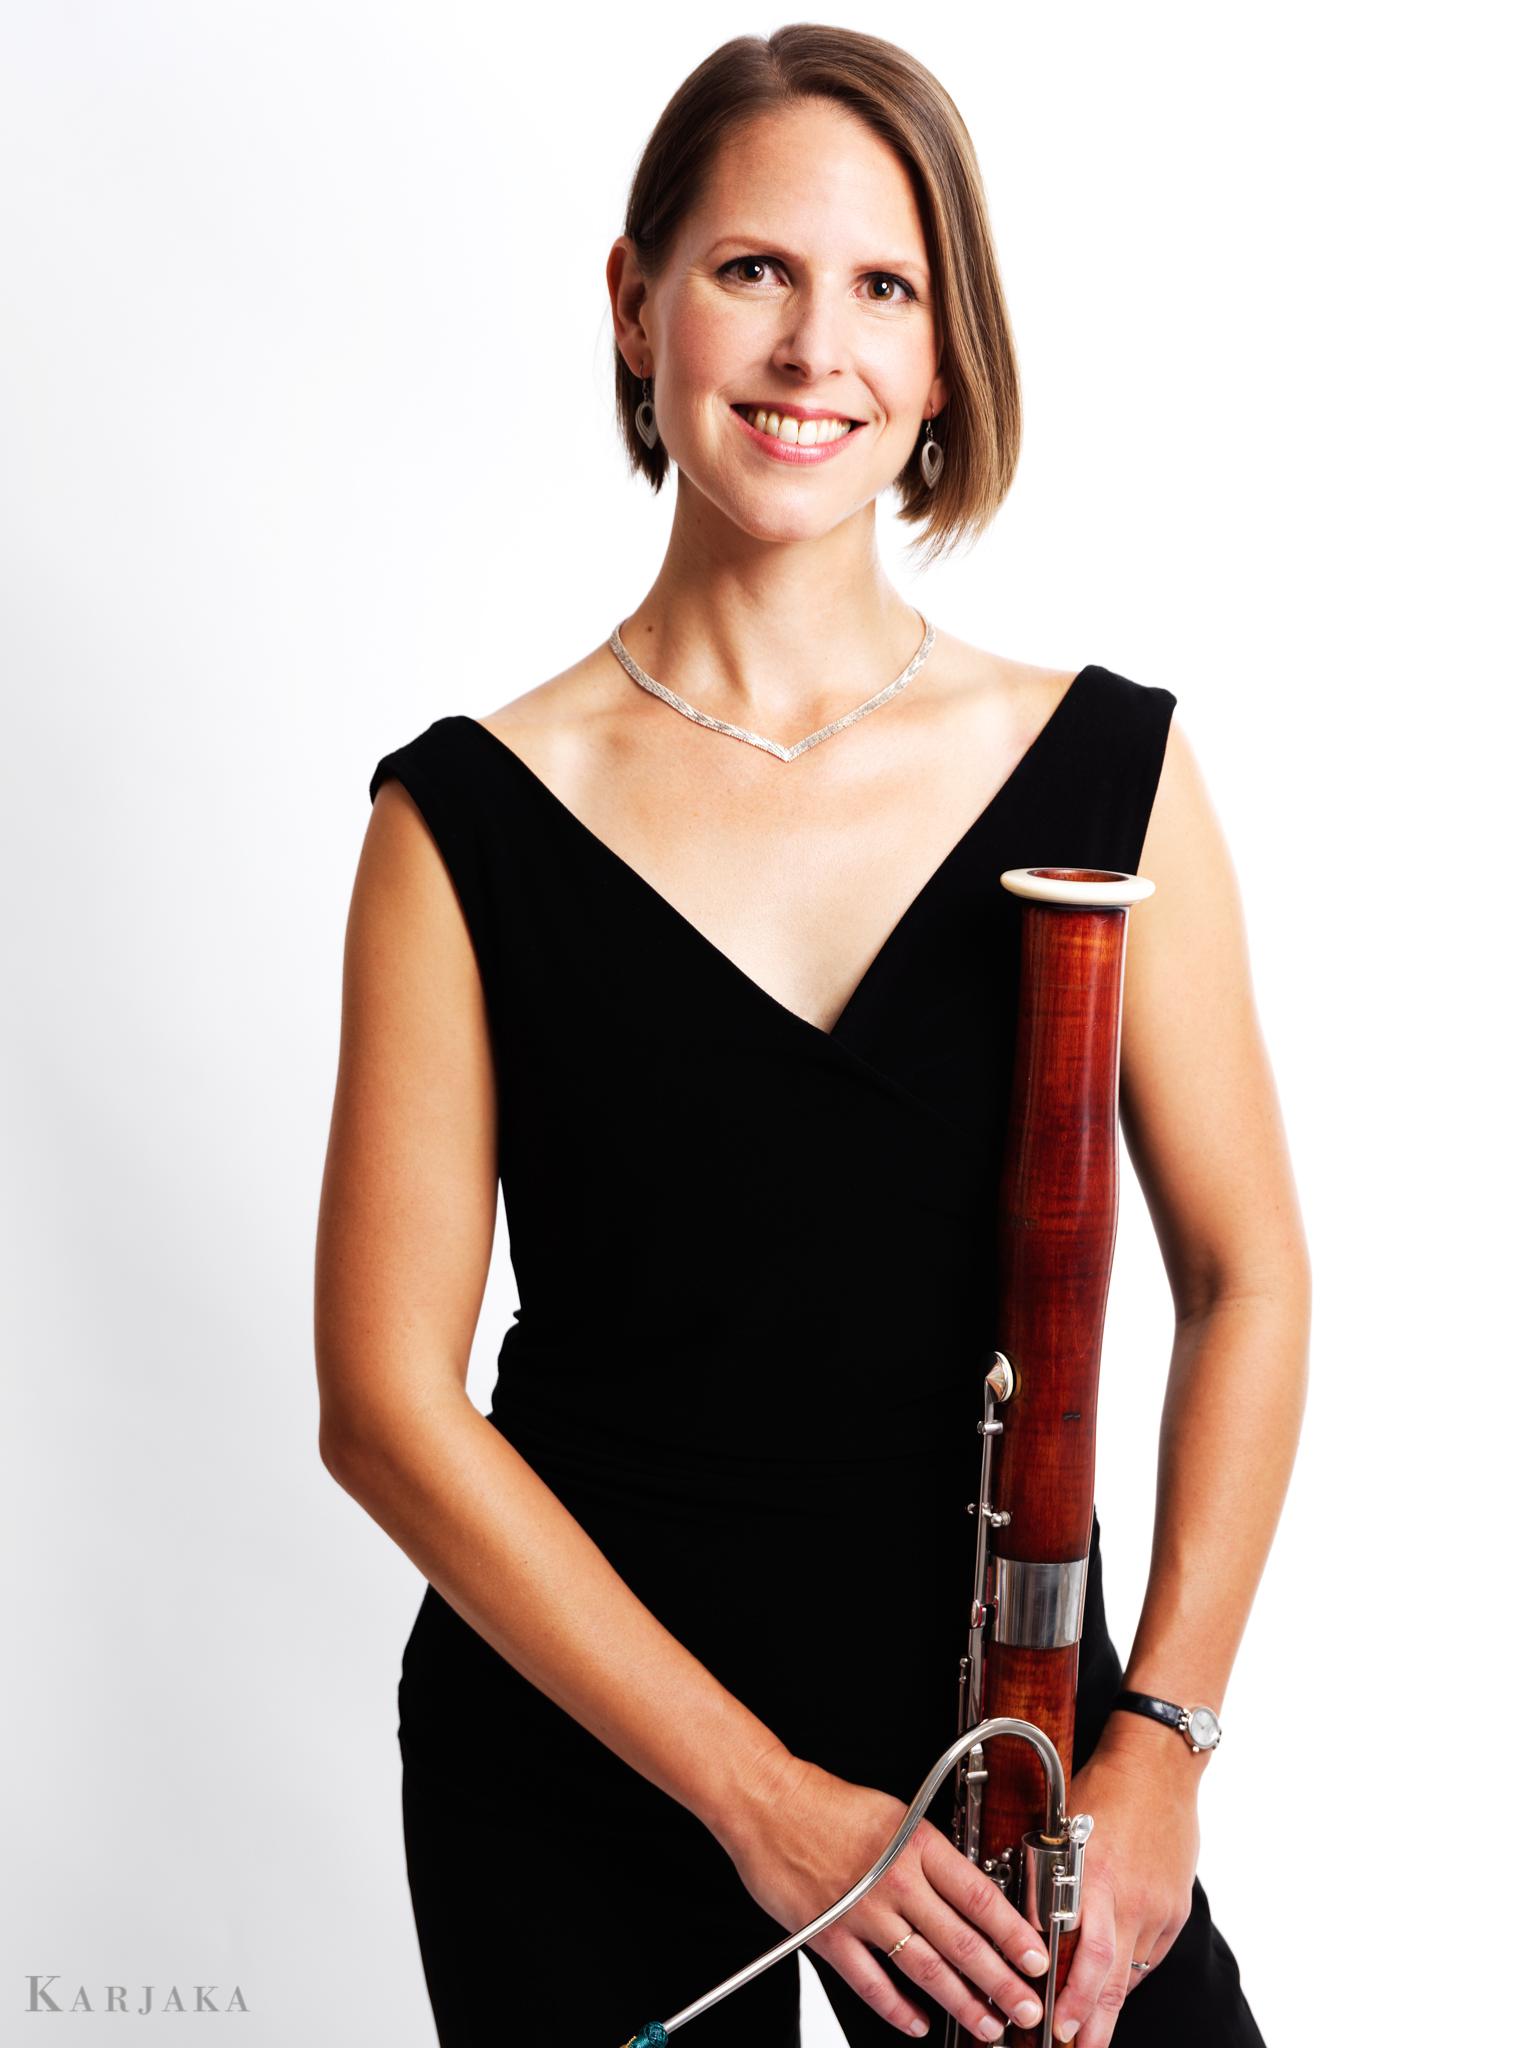 Bassoon, Stephanie Corwin, Principal